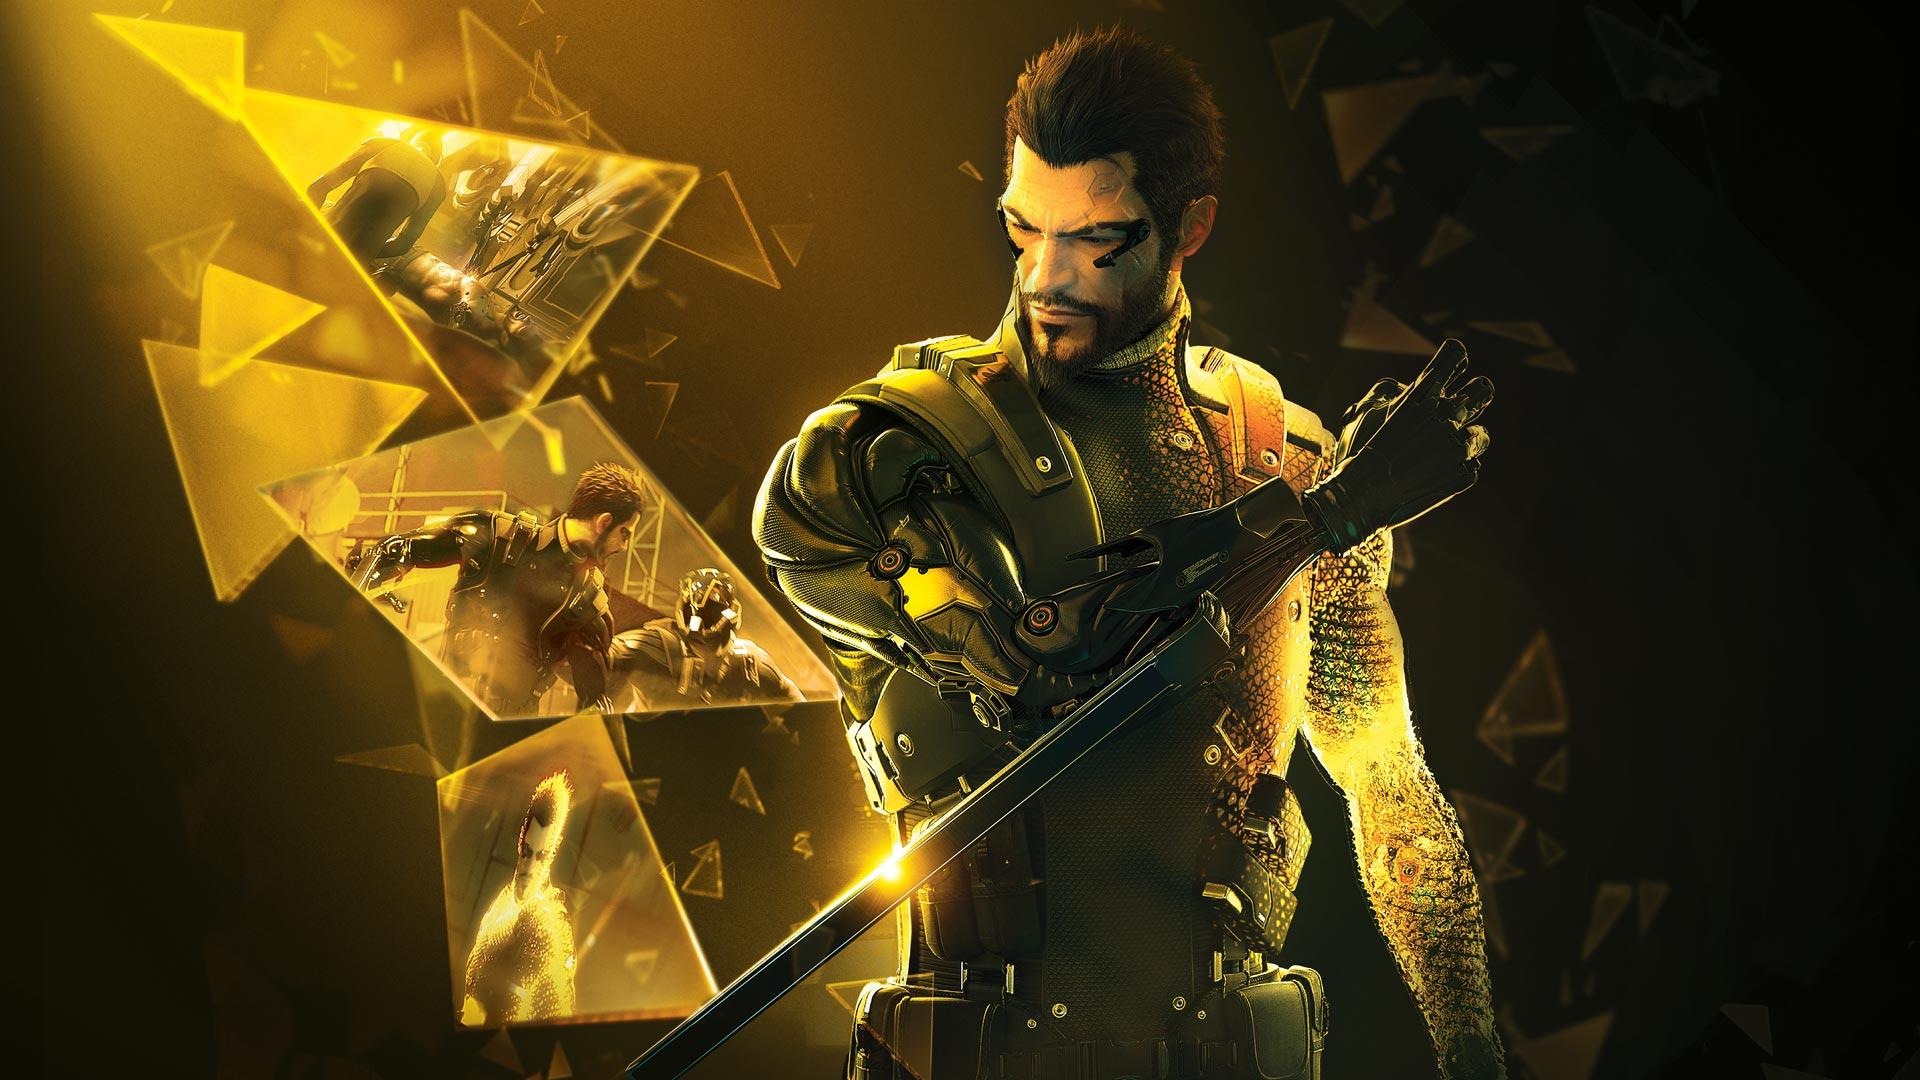 d6e80230d3e93b8e407a44e8b5901ea8b2156f77.jpg - Deus Ex: Human Revolution